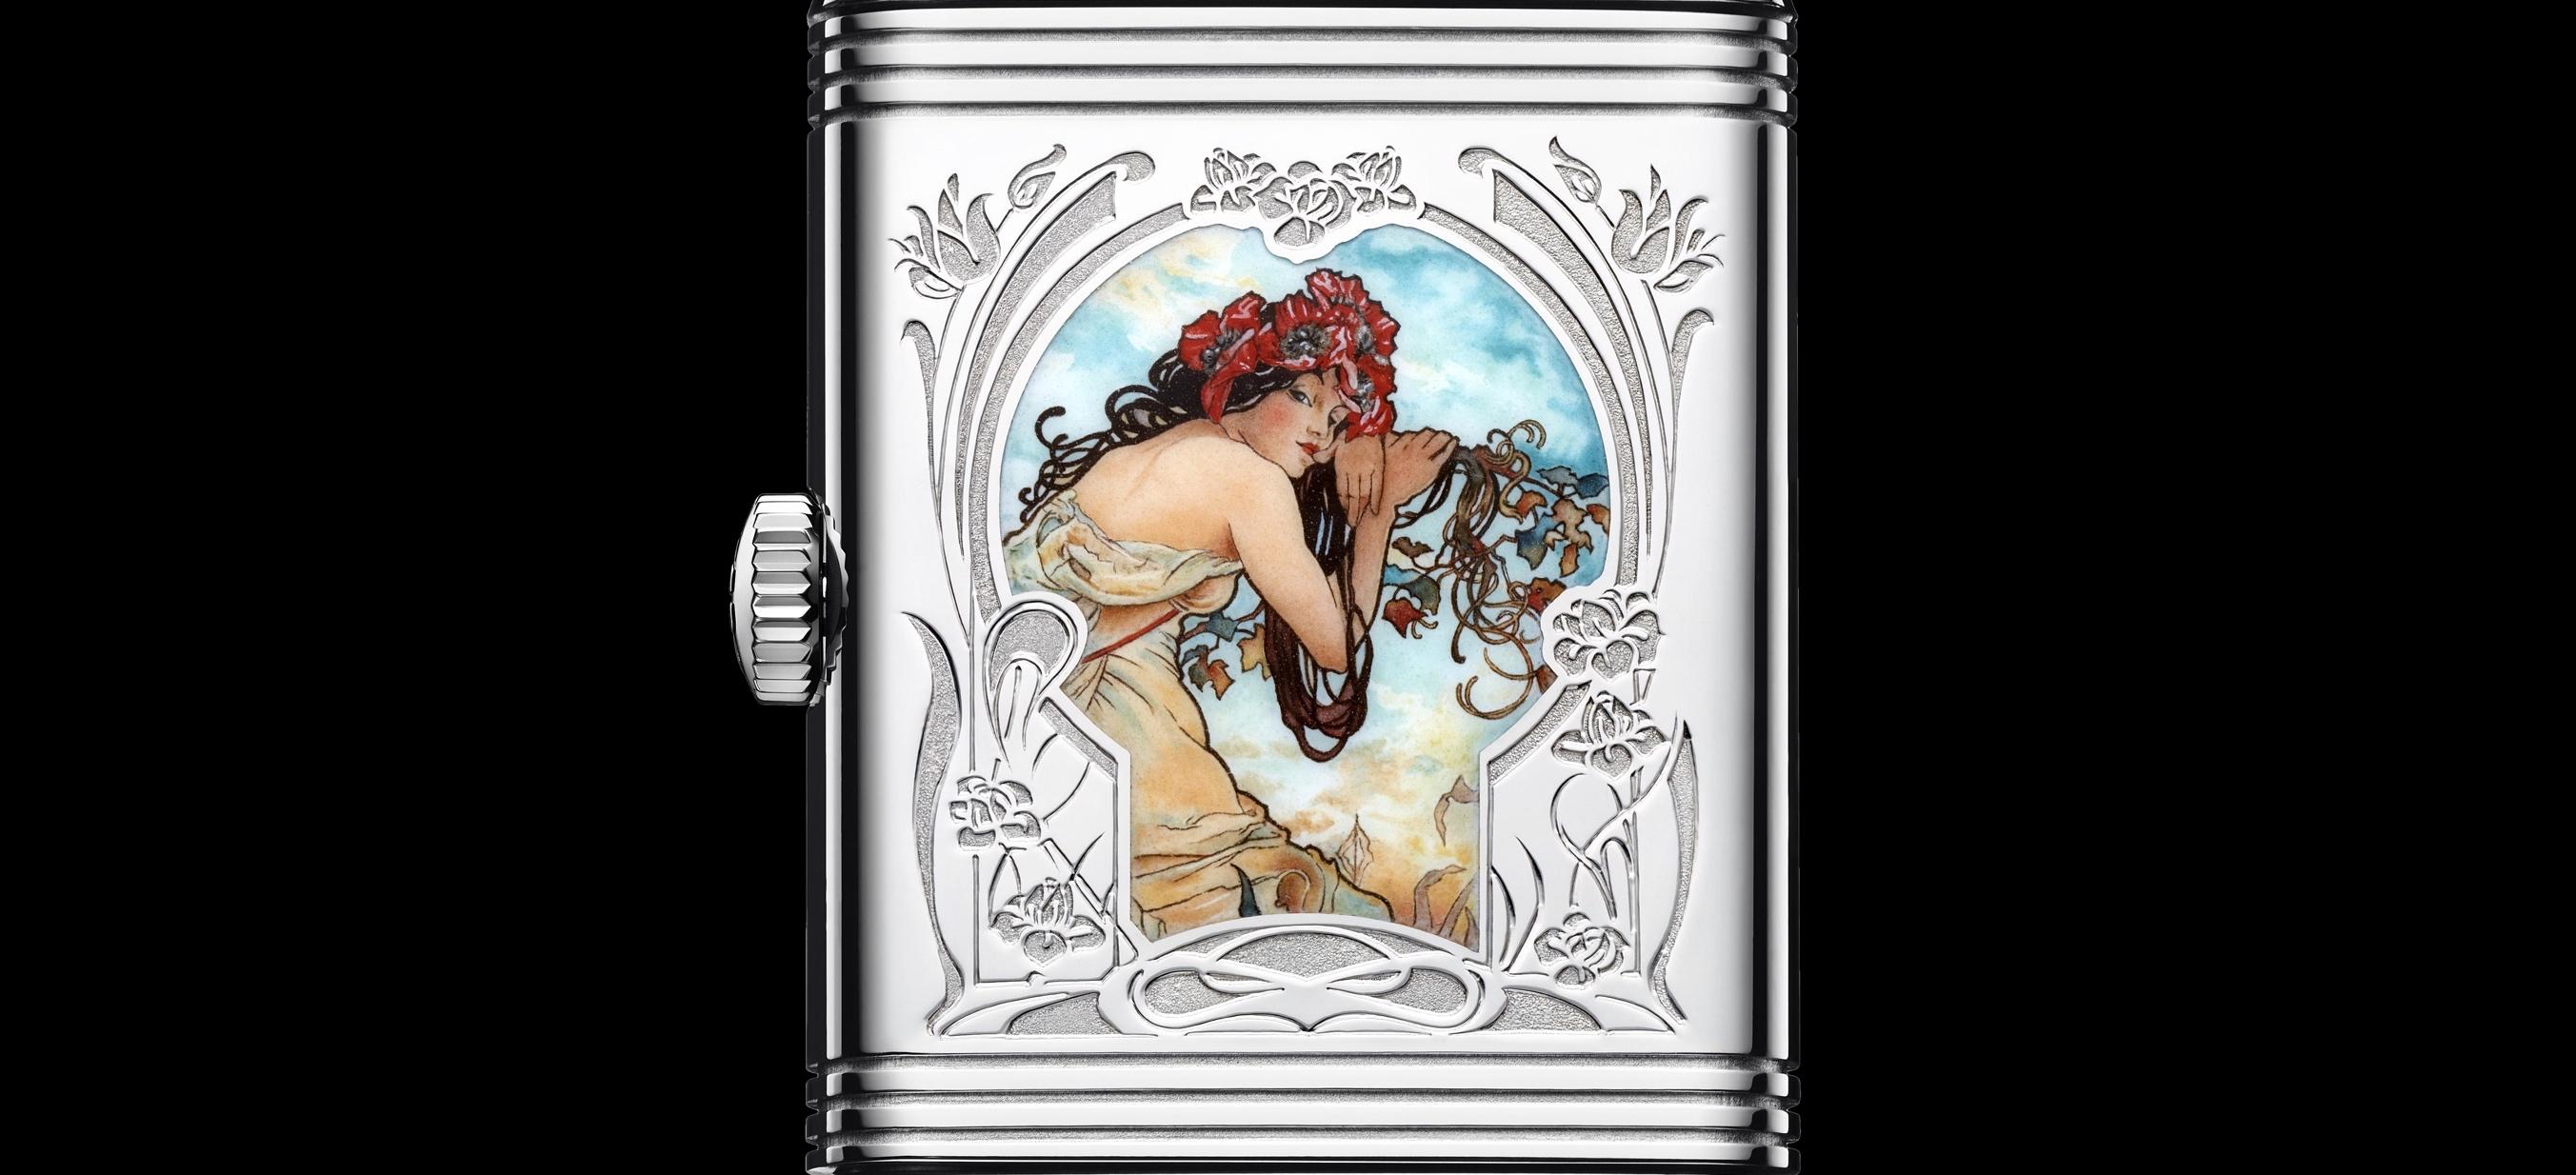 Jaeger-LeCoultre Reverso Tribute Enamel Alfons Mucha - cover